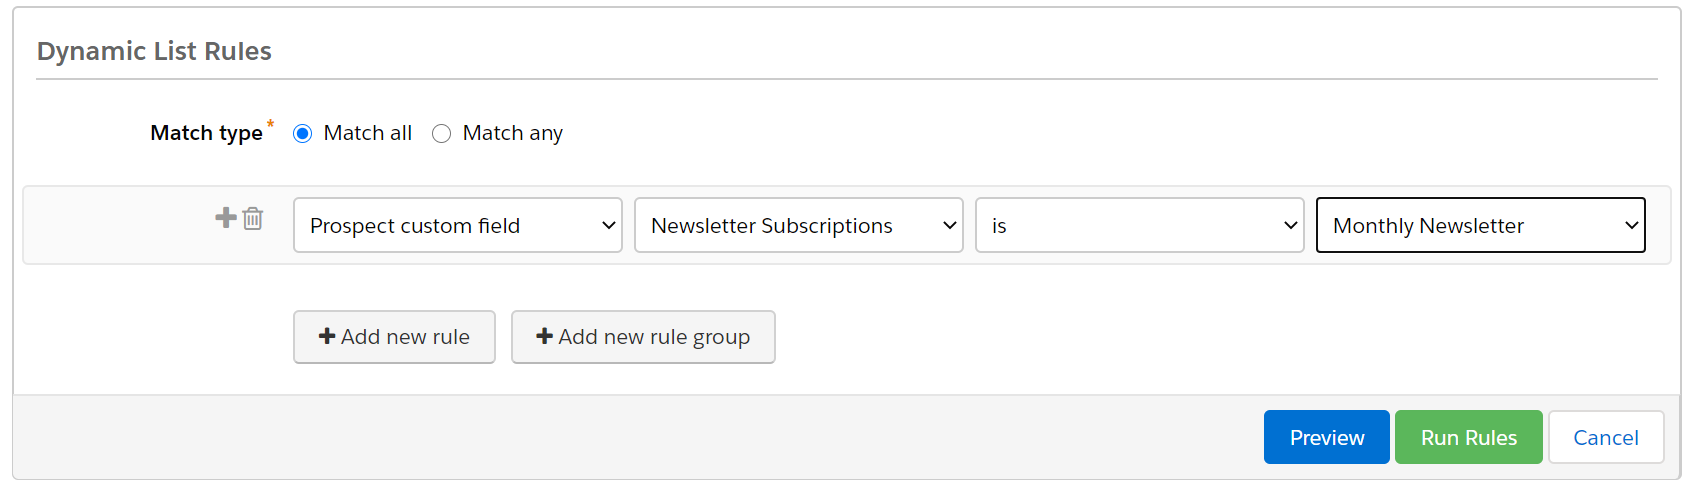 Dynamic list for Newsletter Subscription